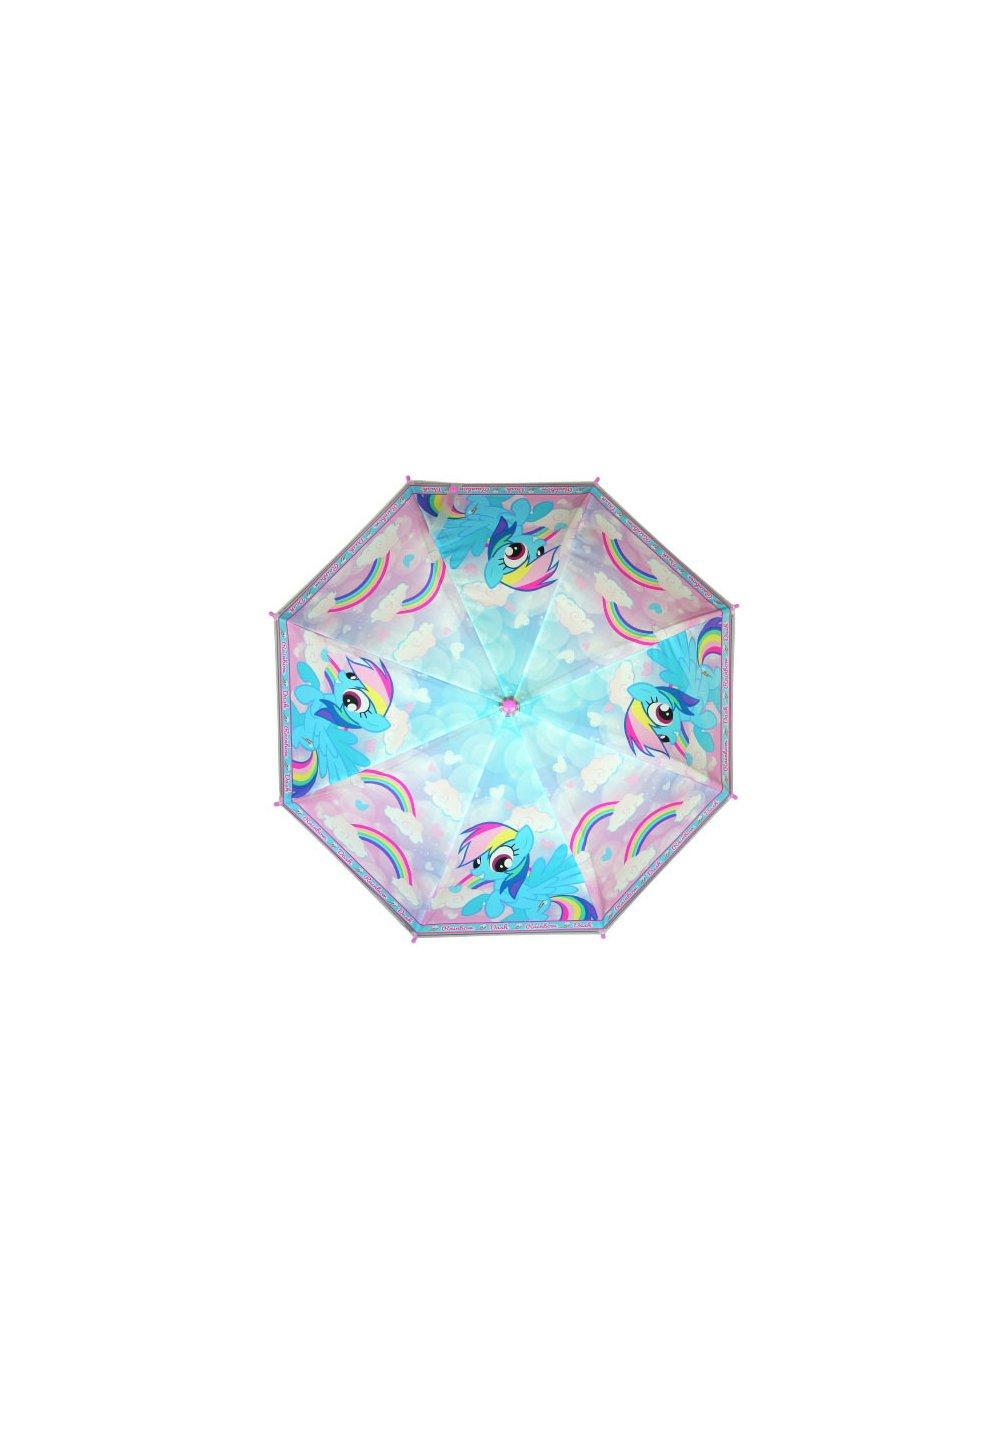 Umbrela automata, Rainbow dash imagine